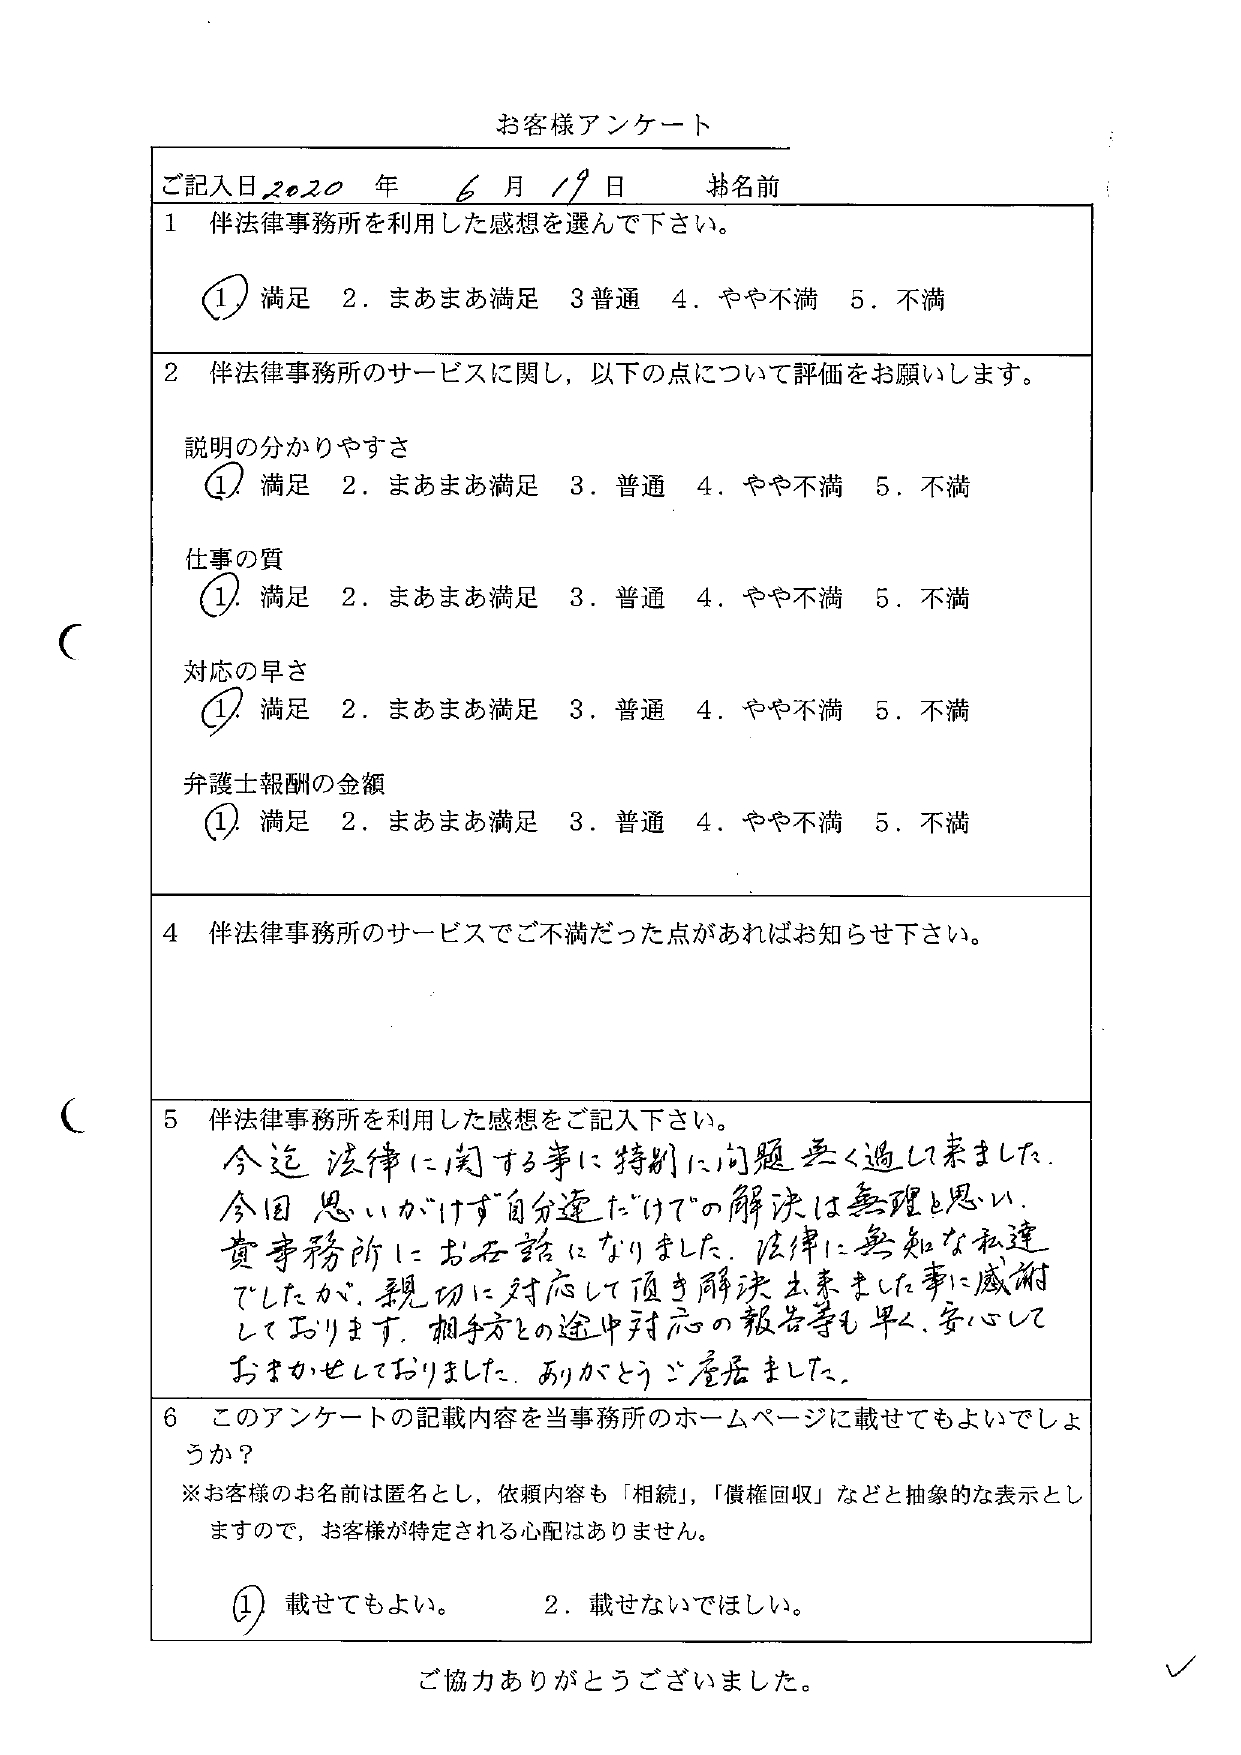 200619(2)_page-0001.jpg